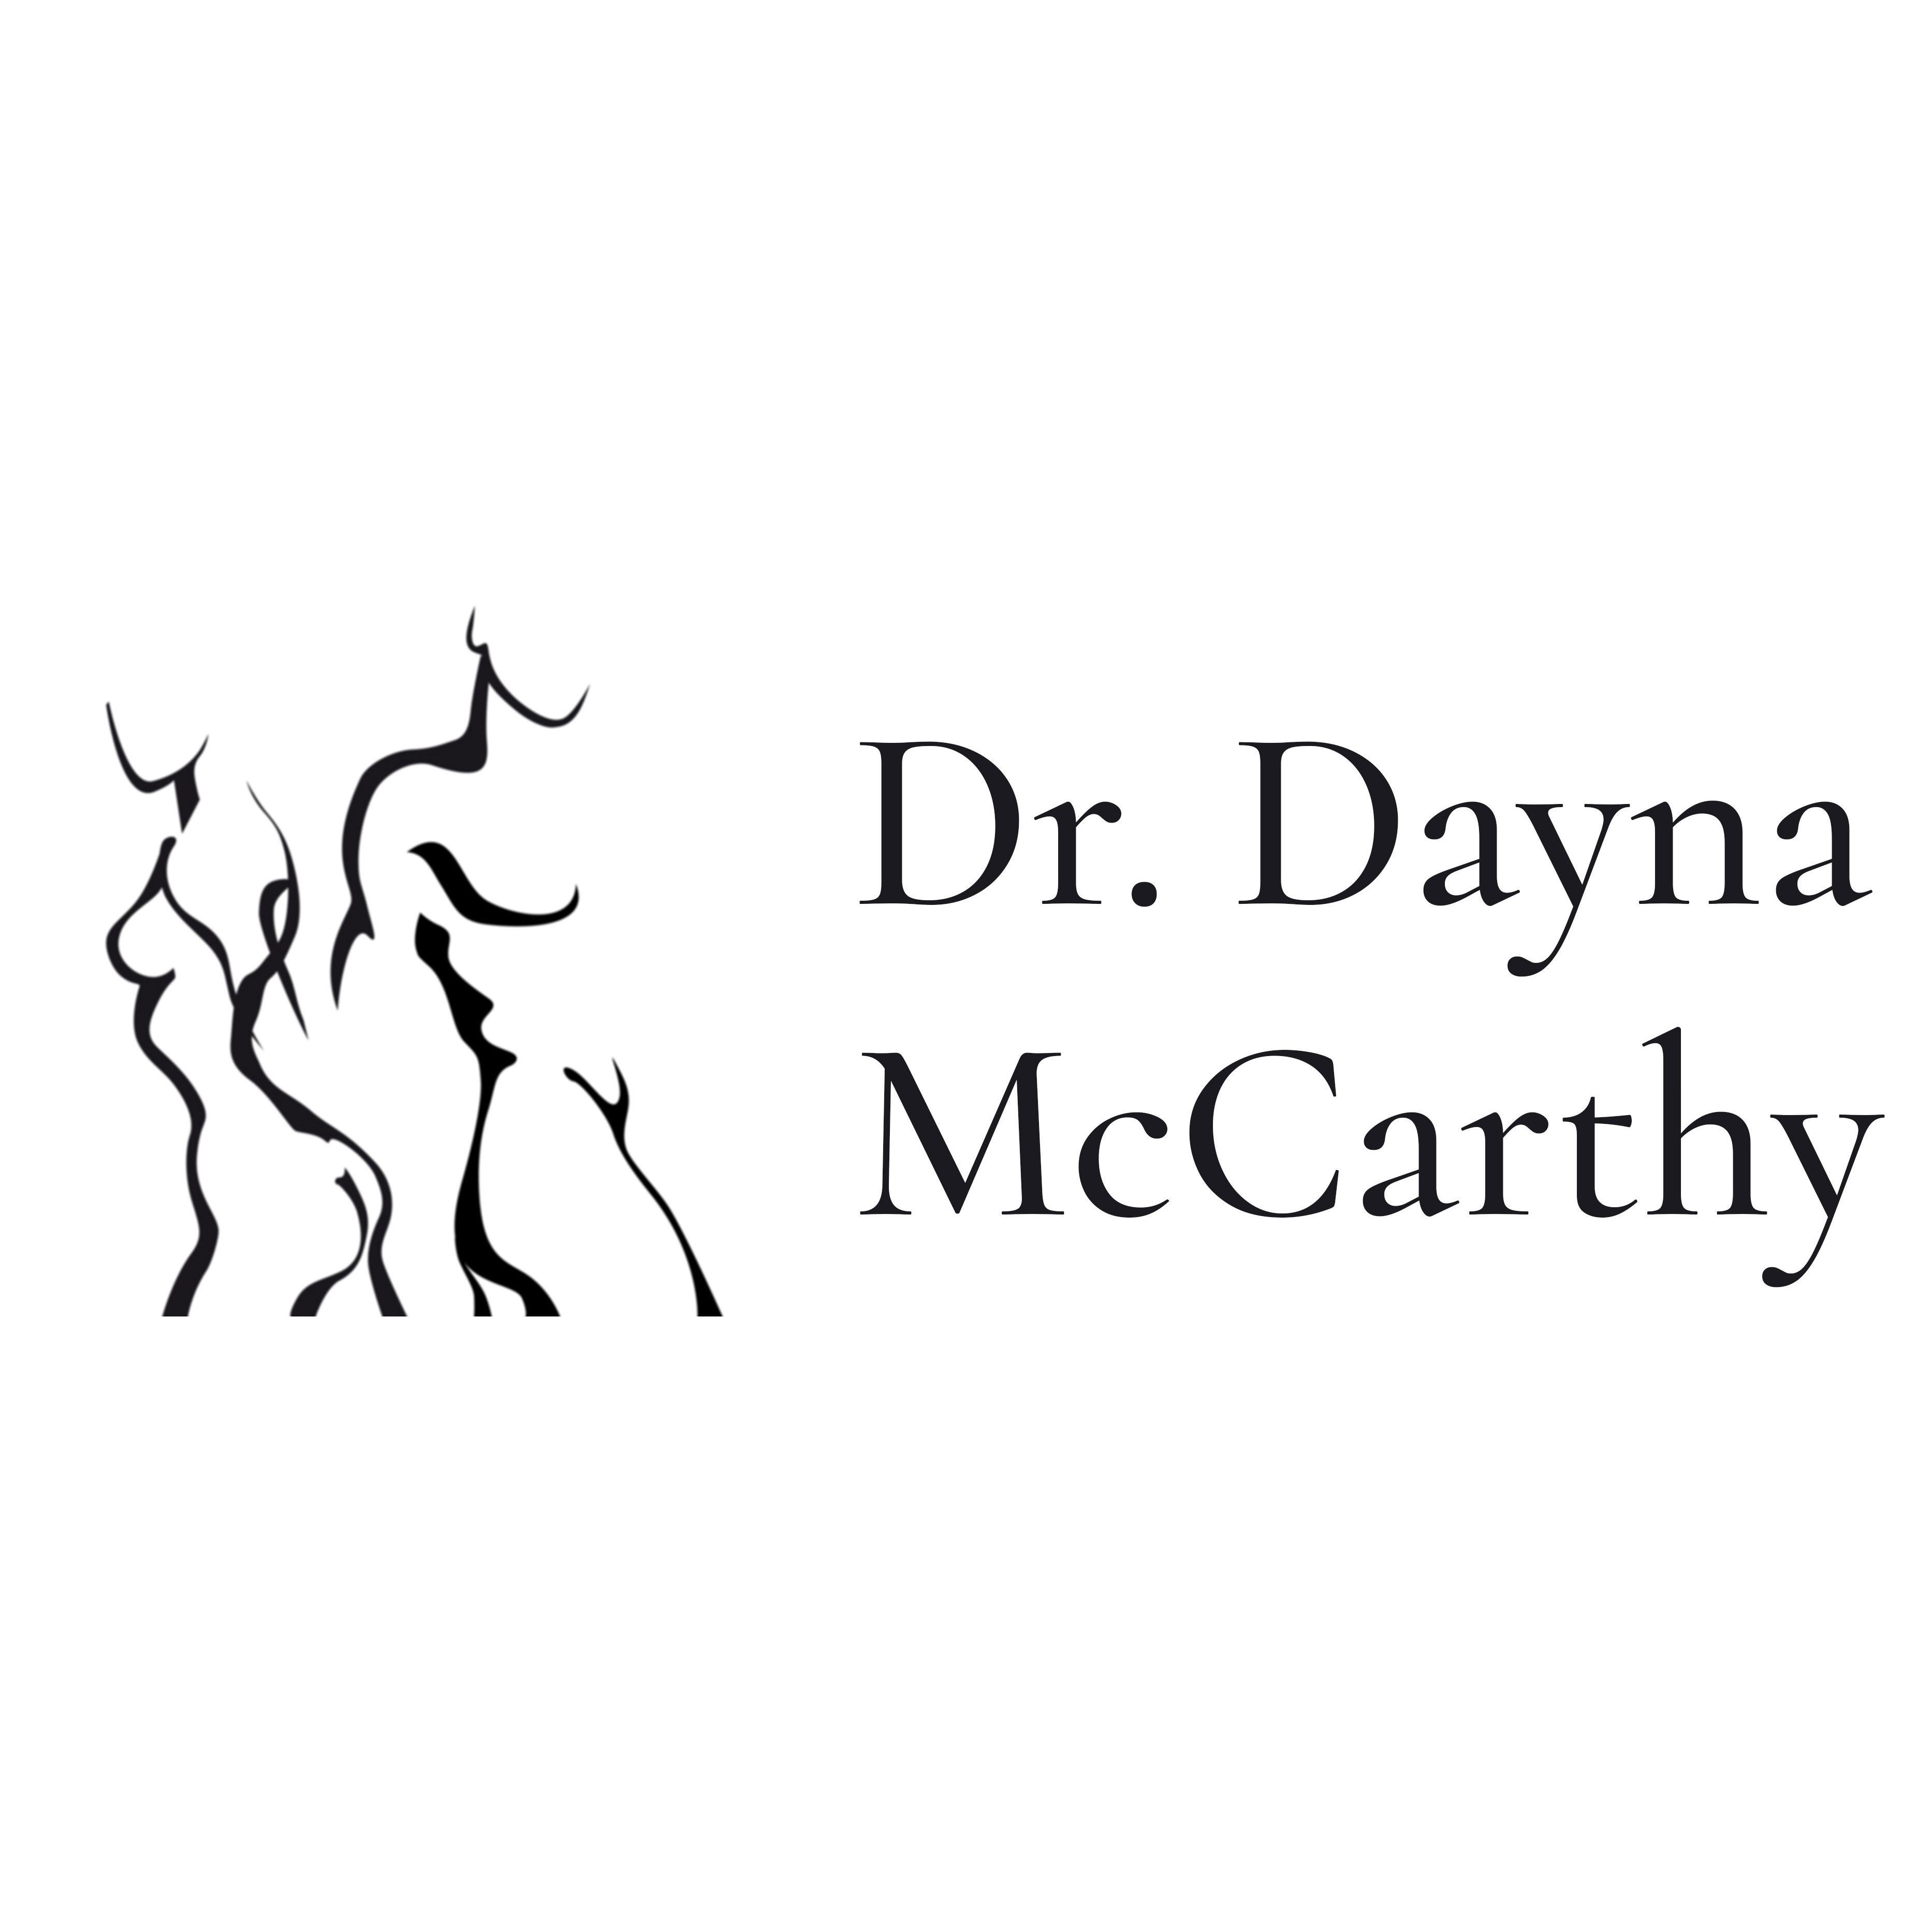 Dr. Dayna McCarthy Medical Aesthetics